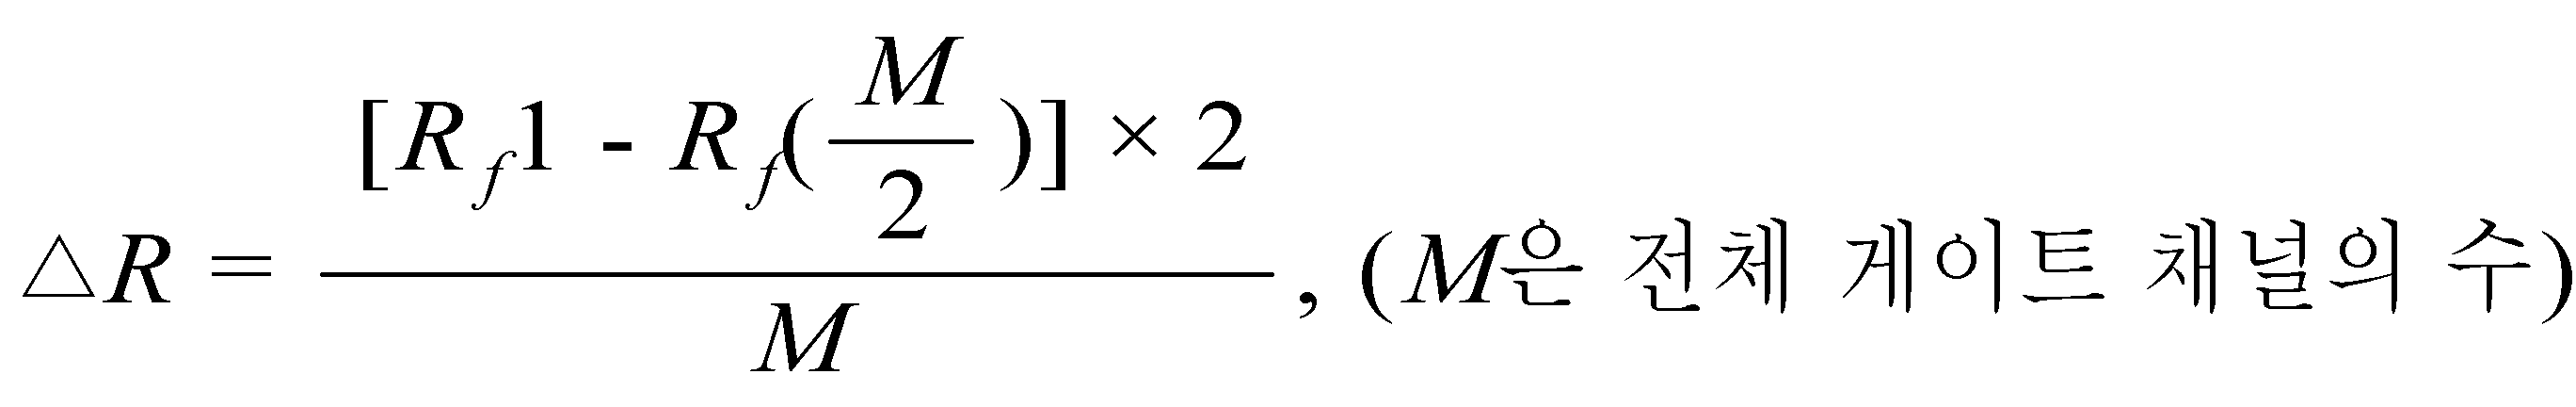 Figure 112004051423902-pat00001